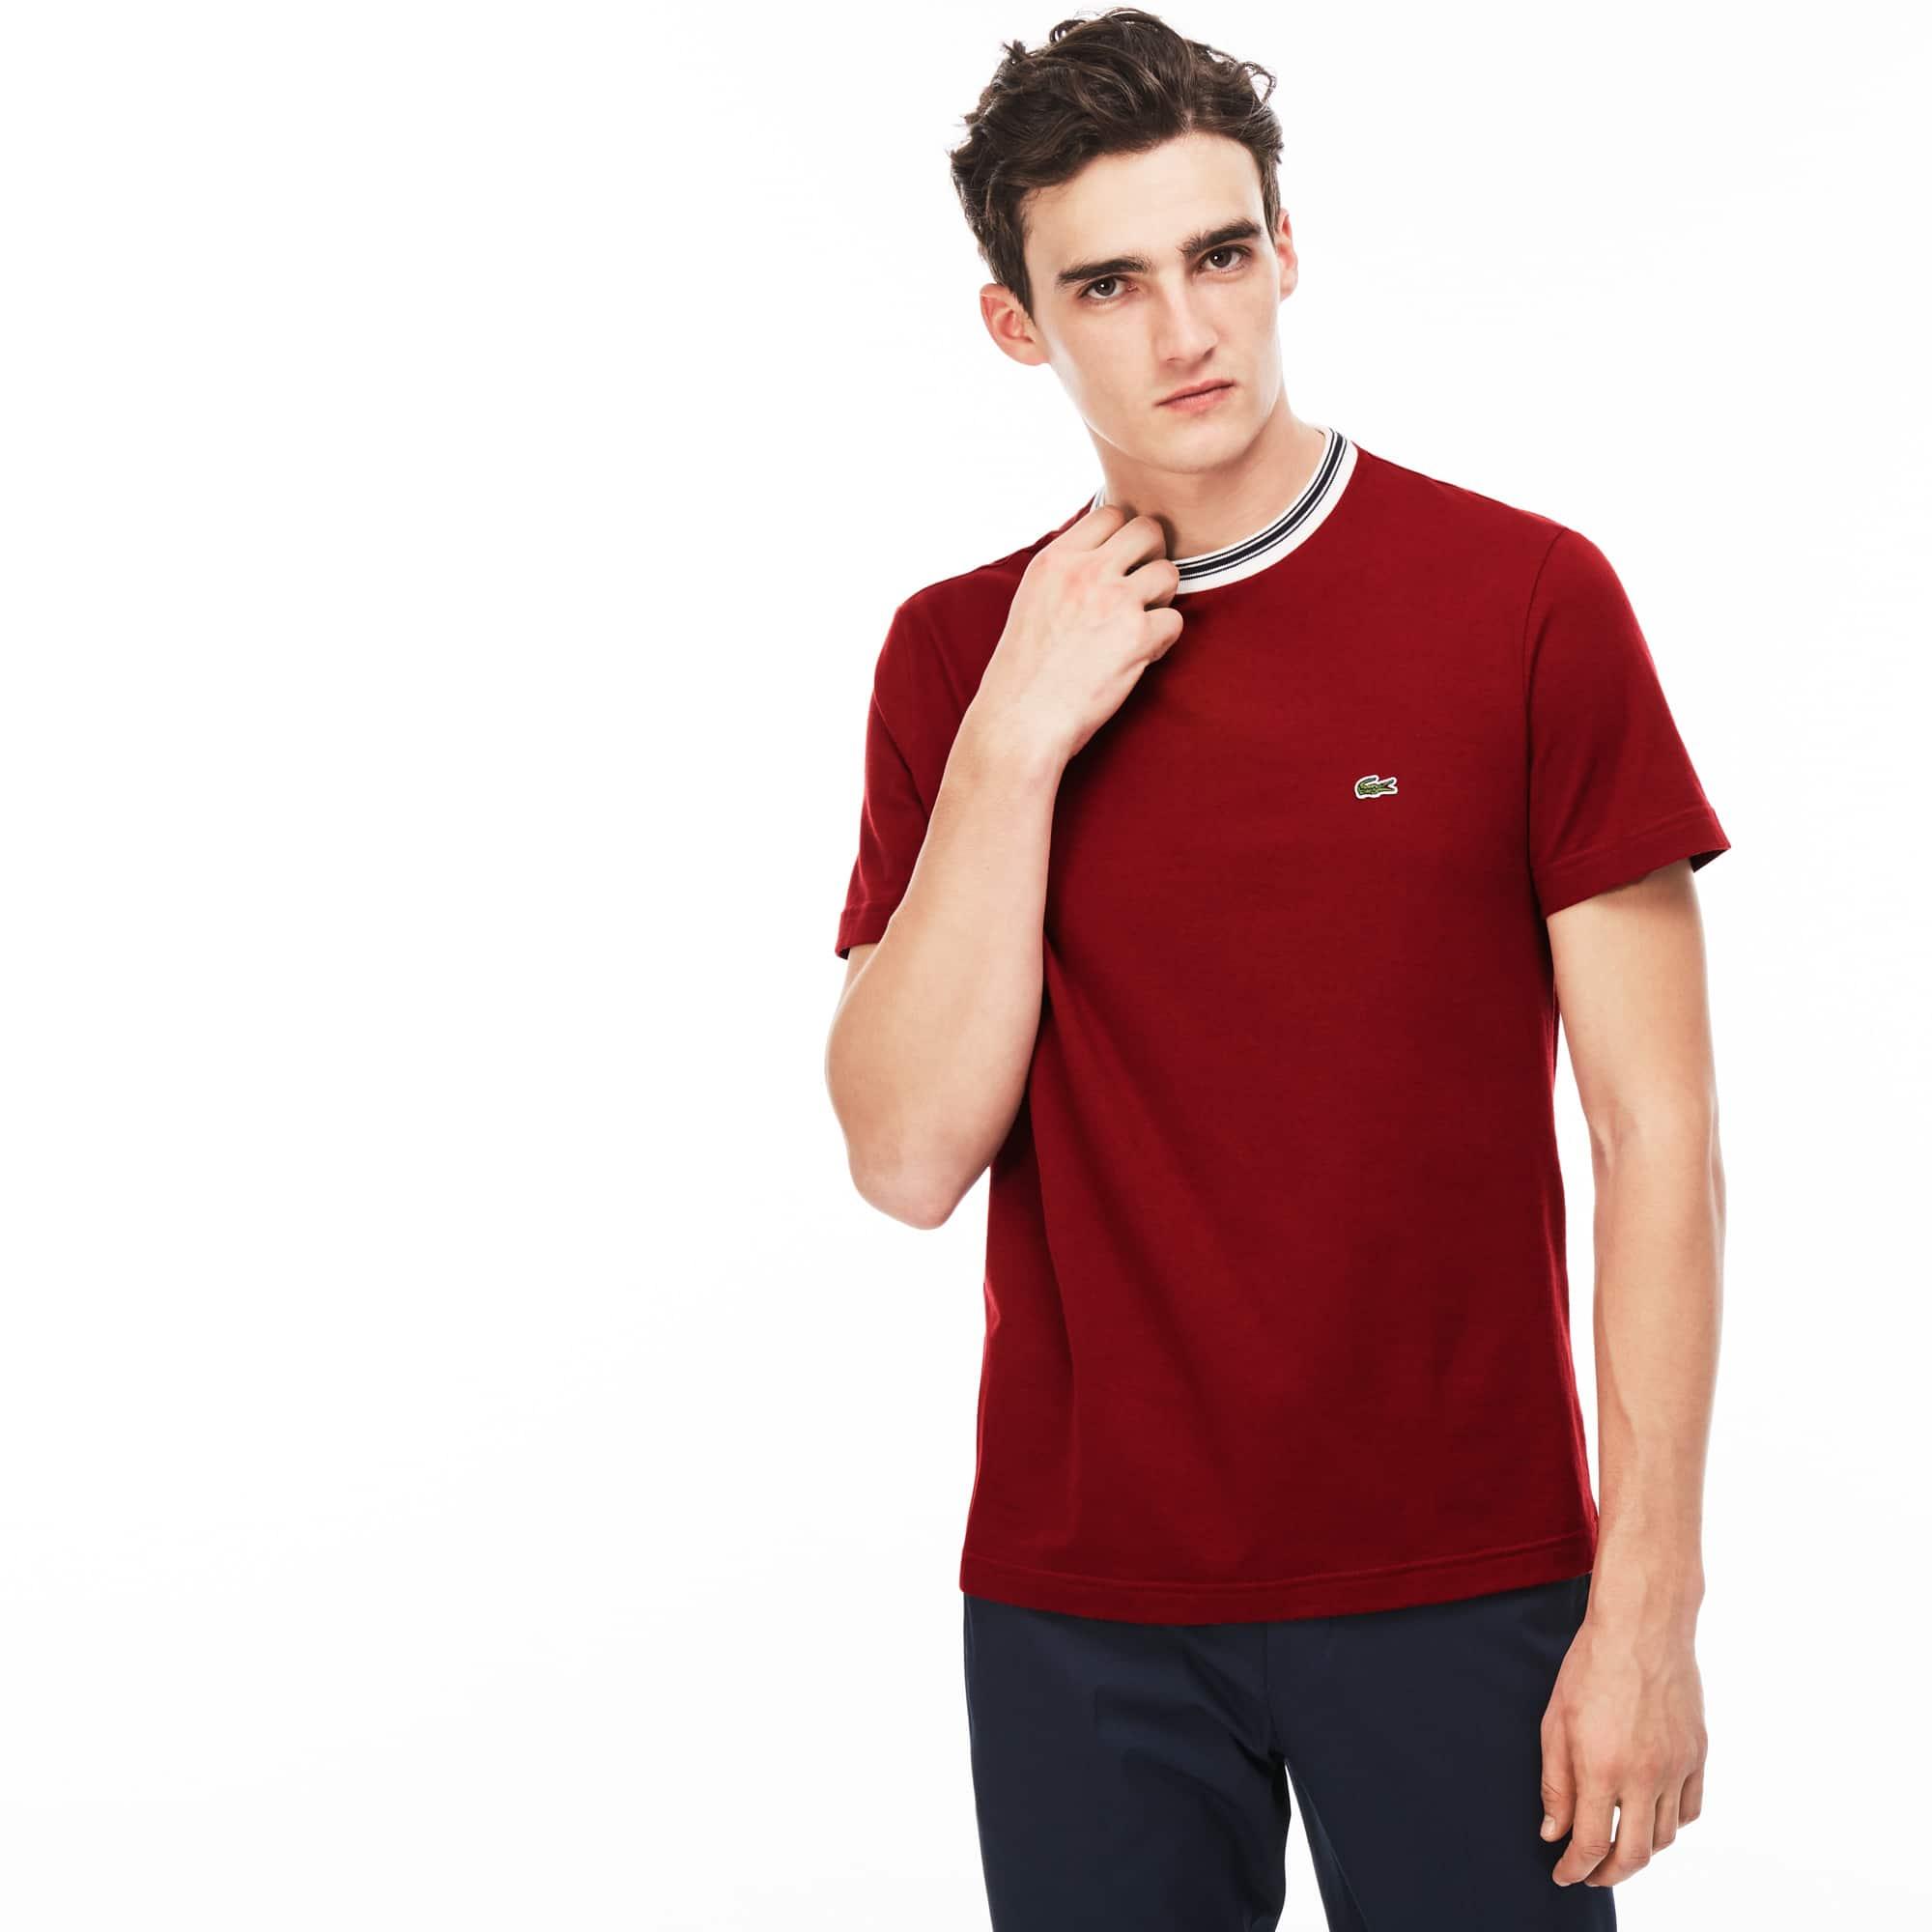 Camiseta Con Cuello Redondo De Punto De Algodón Liso